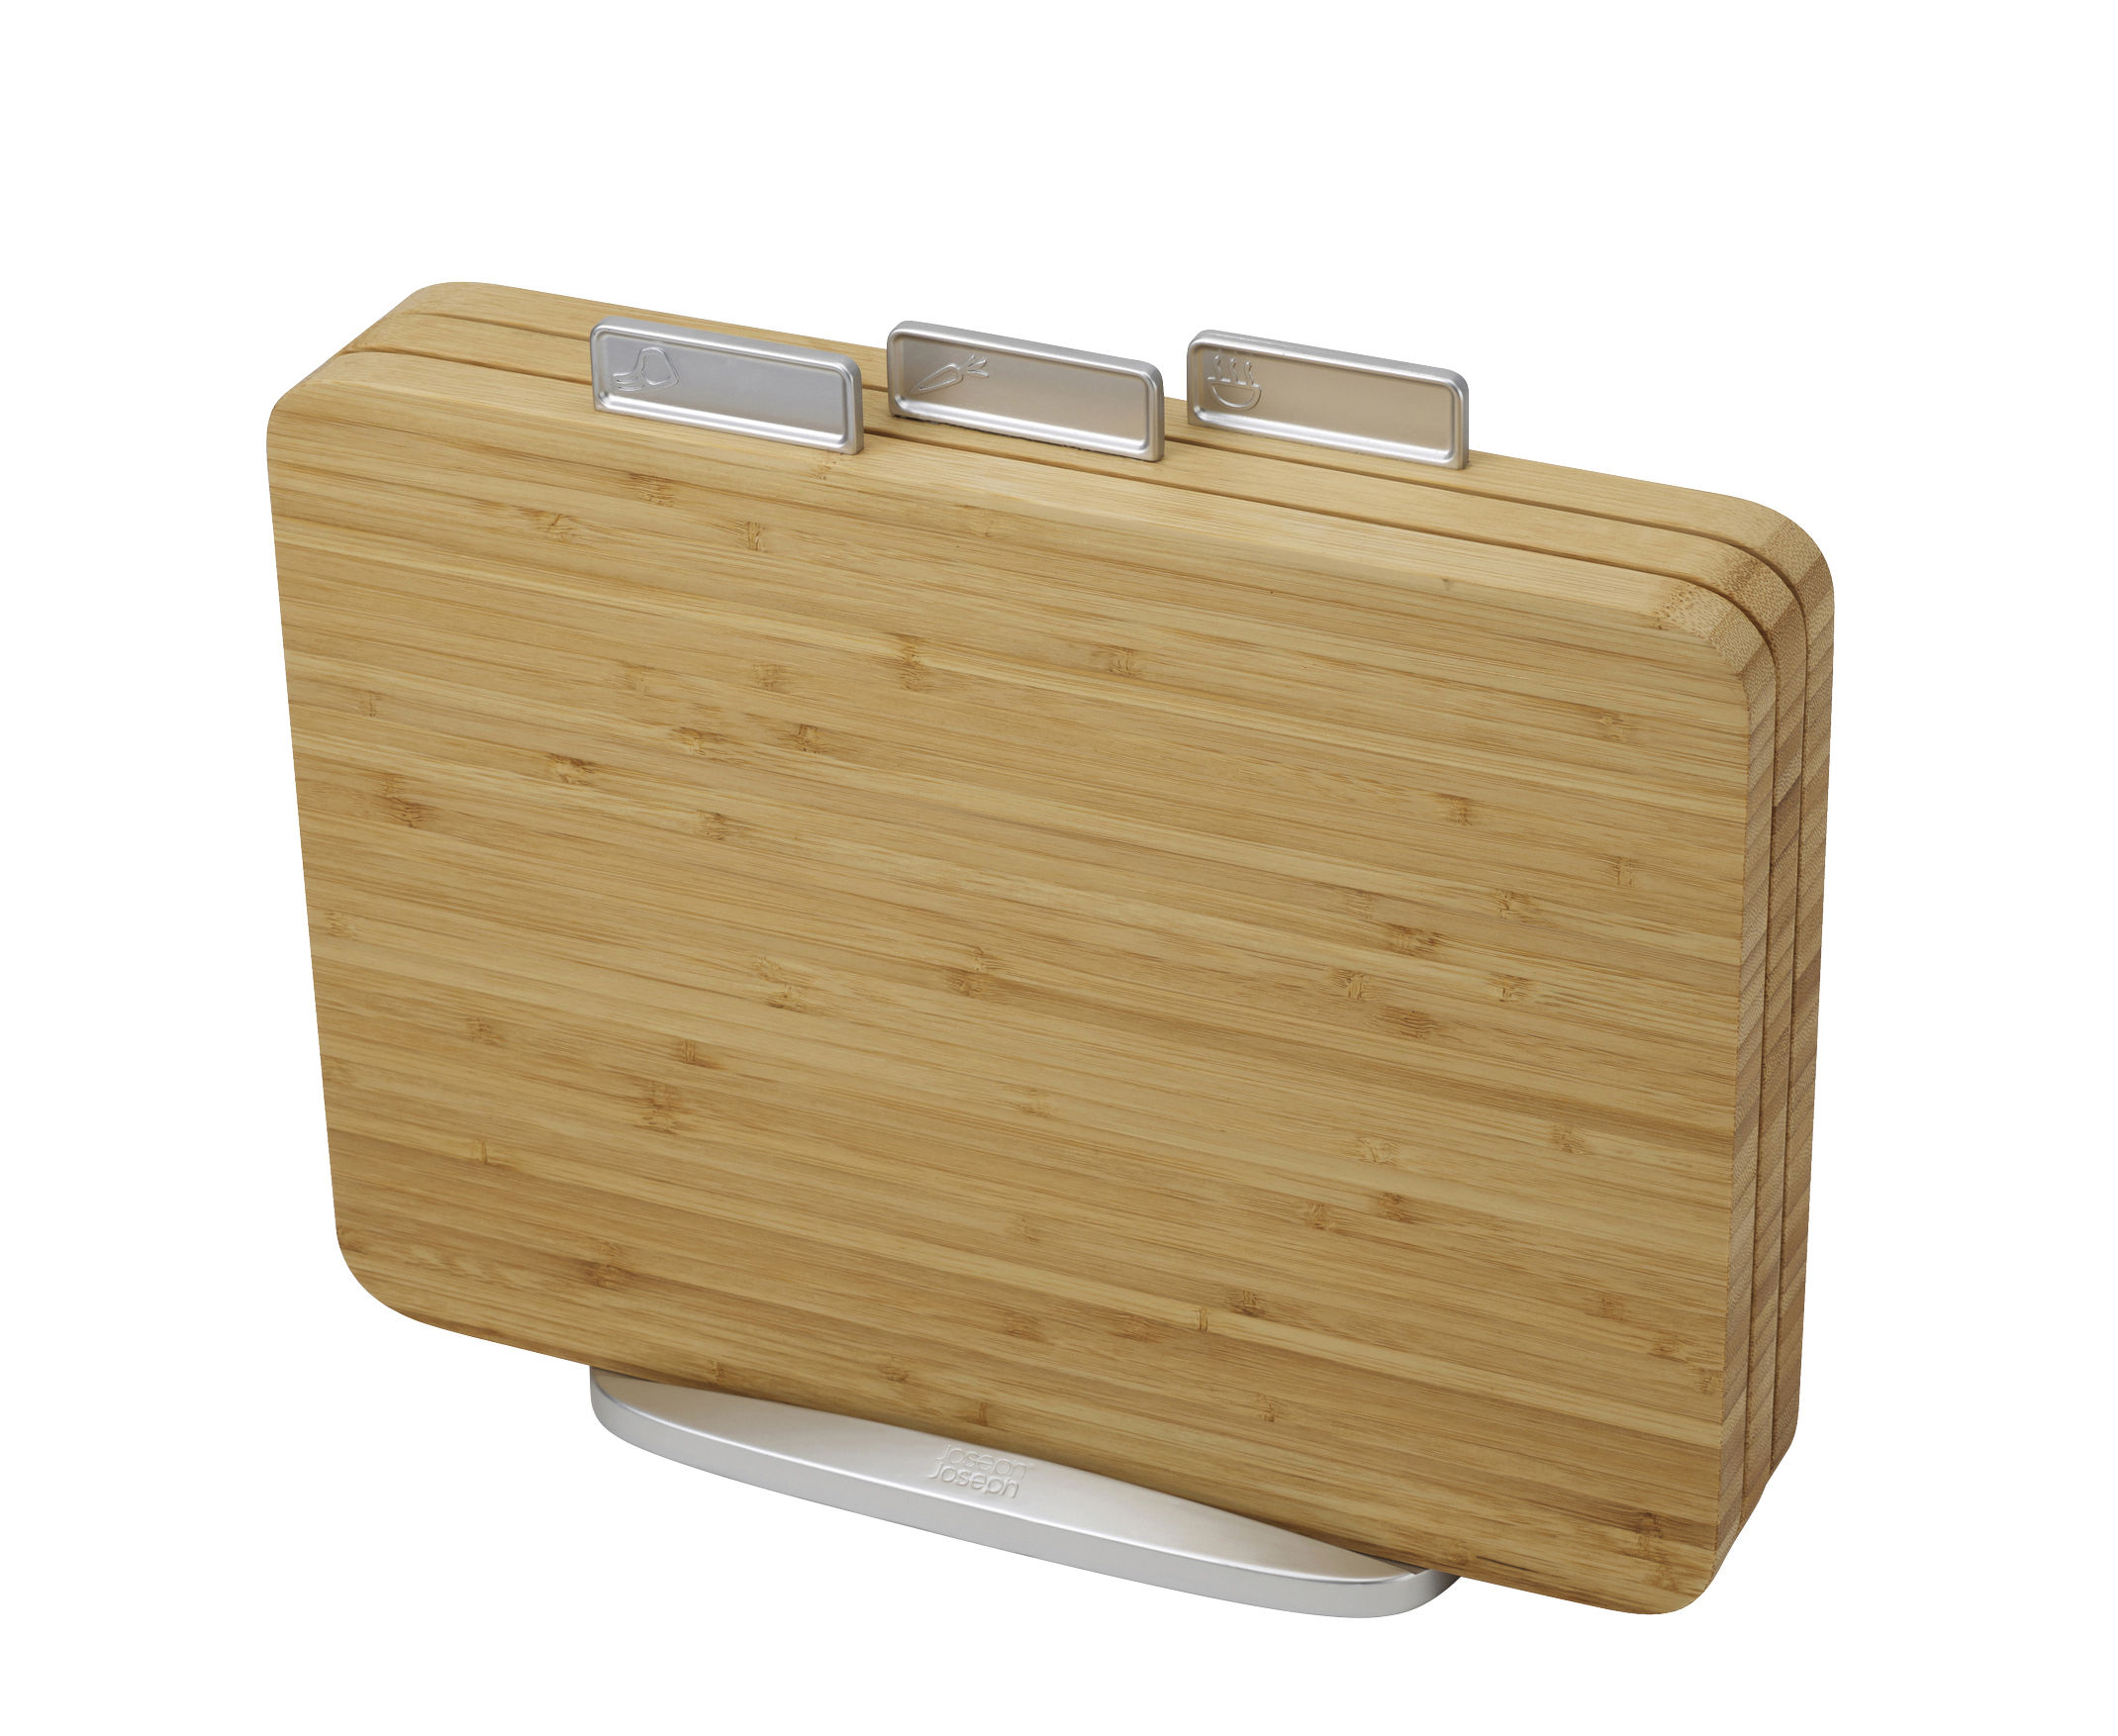 Küche - Küchenutensilien - Index Schneidebrett Bambus / 3er-Set + Ständer - Joseph Joseph - Bambus, natur - Bambus, Metall